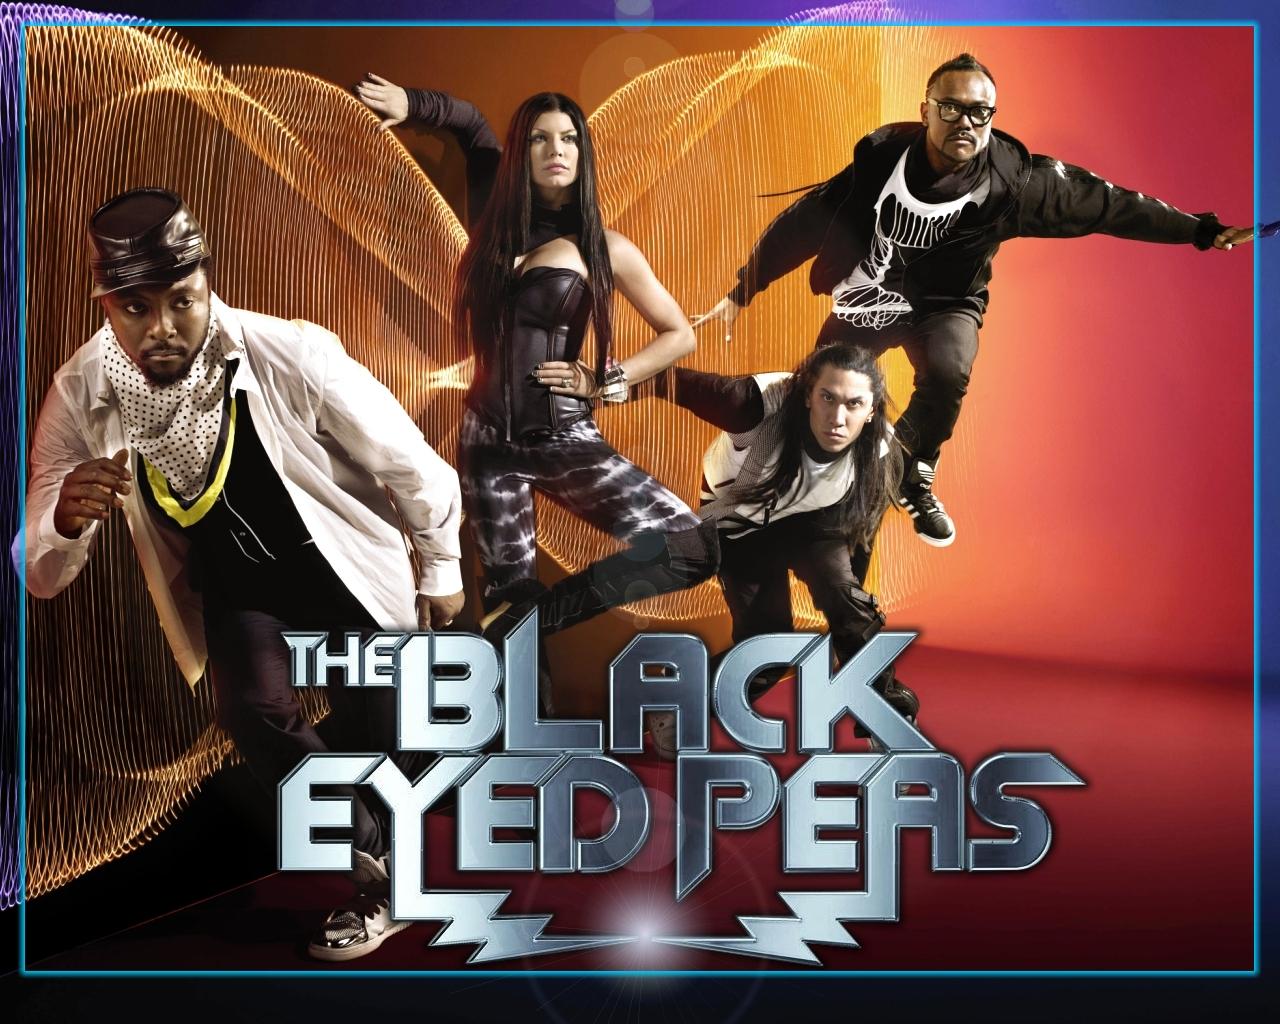 http://2.bp.blogspot.com/-nTwh137TVpk/TvyrwllReOI/AAAAAAAAM4U/bx1m_UGu5uo/s1600/Black+Eyed+Peas+wallpapers.jpg